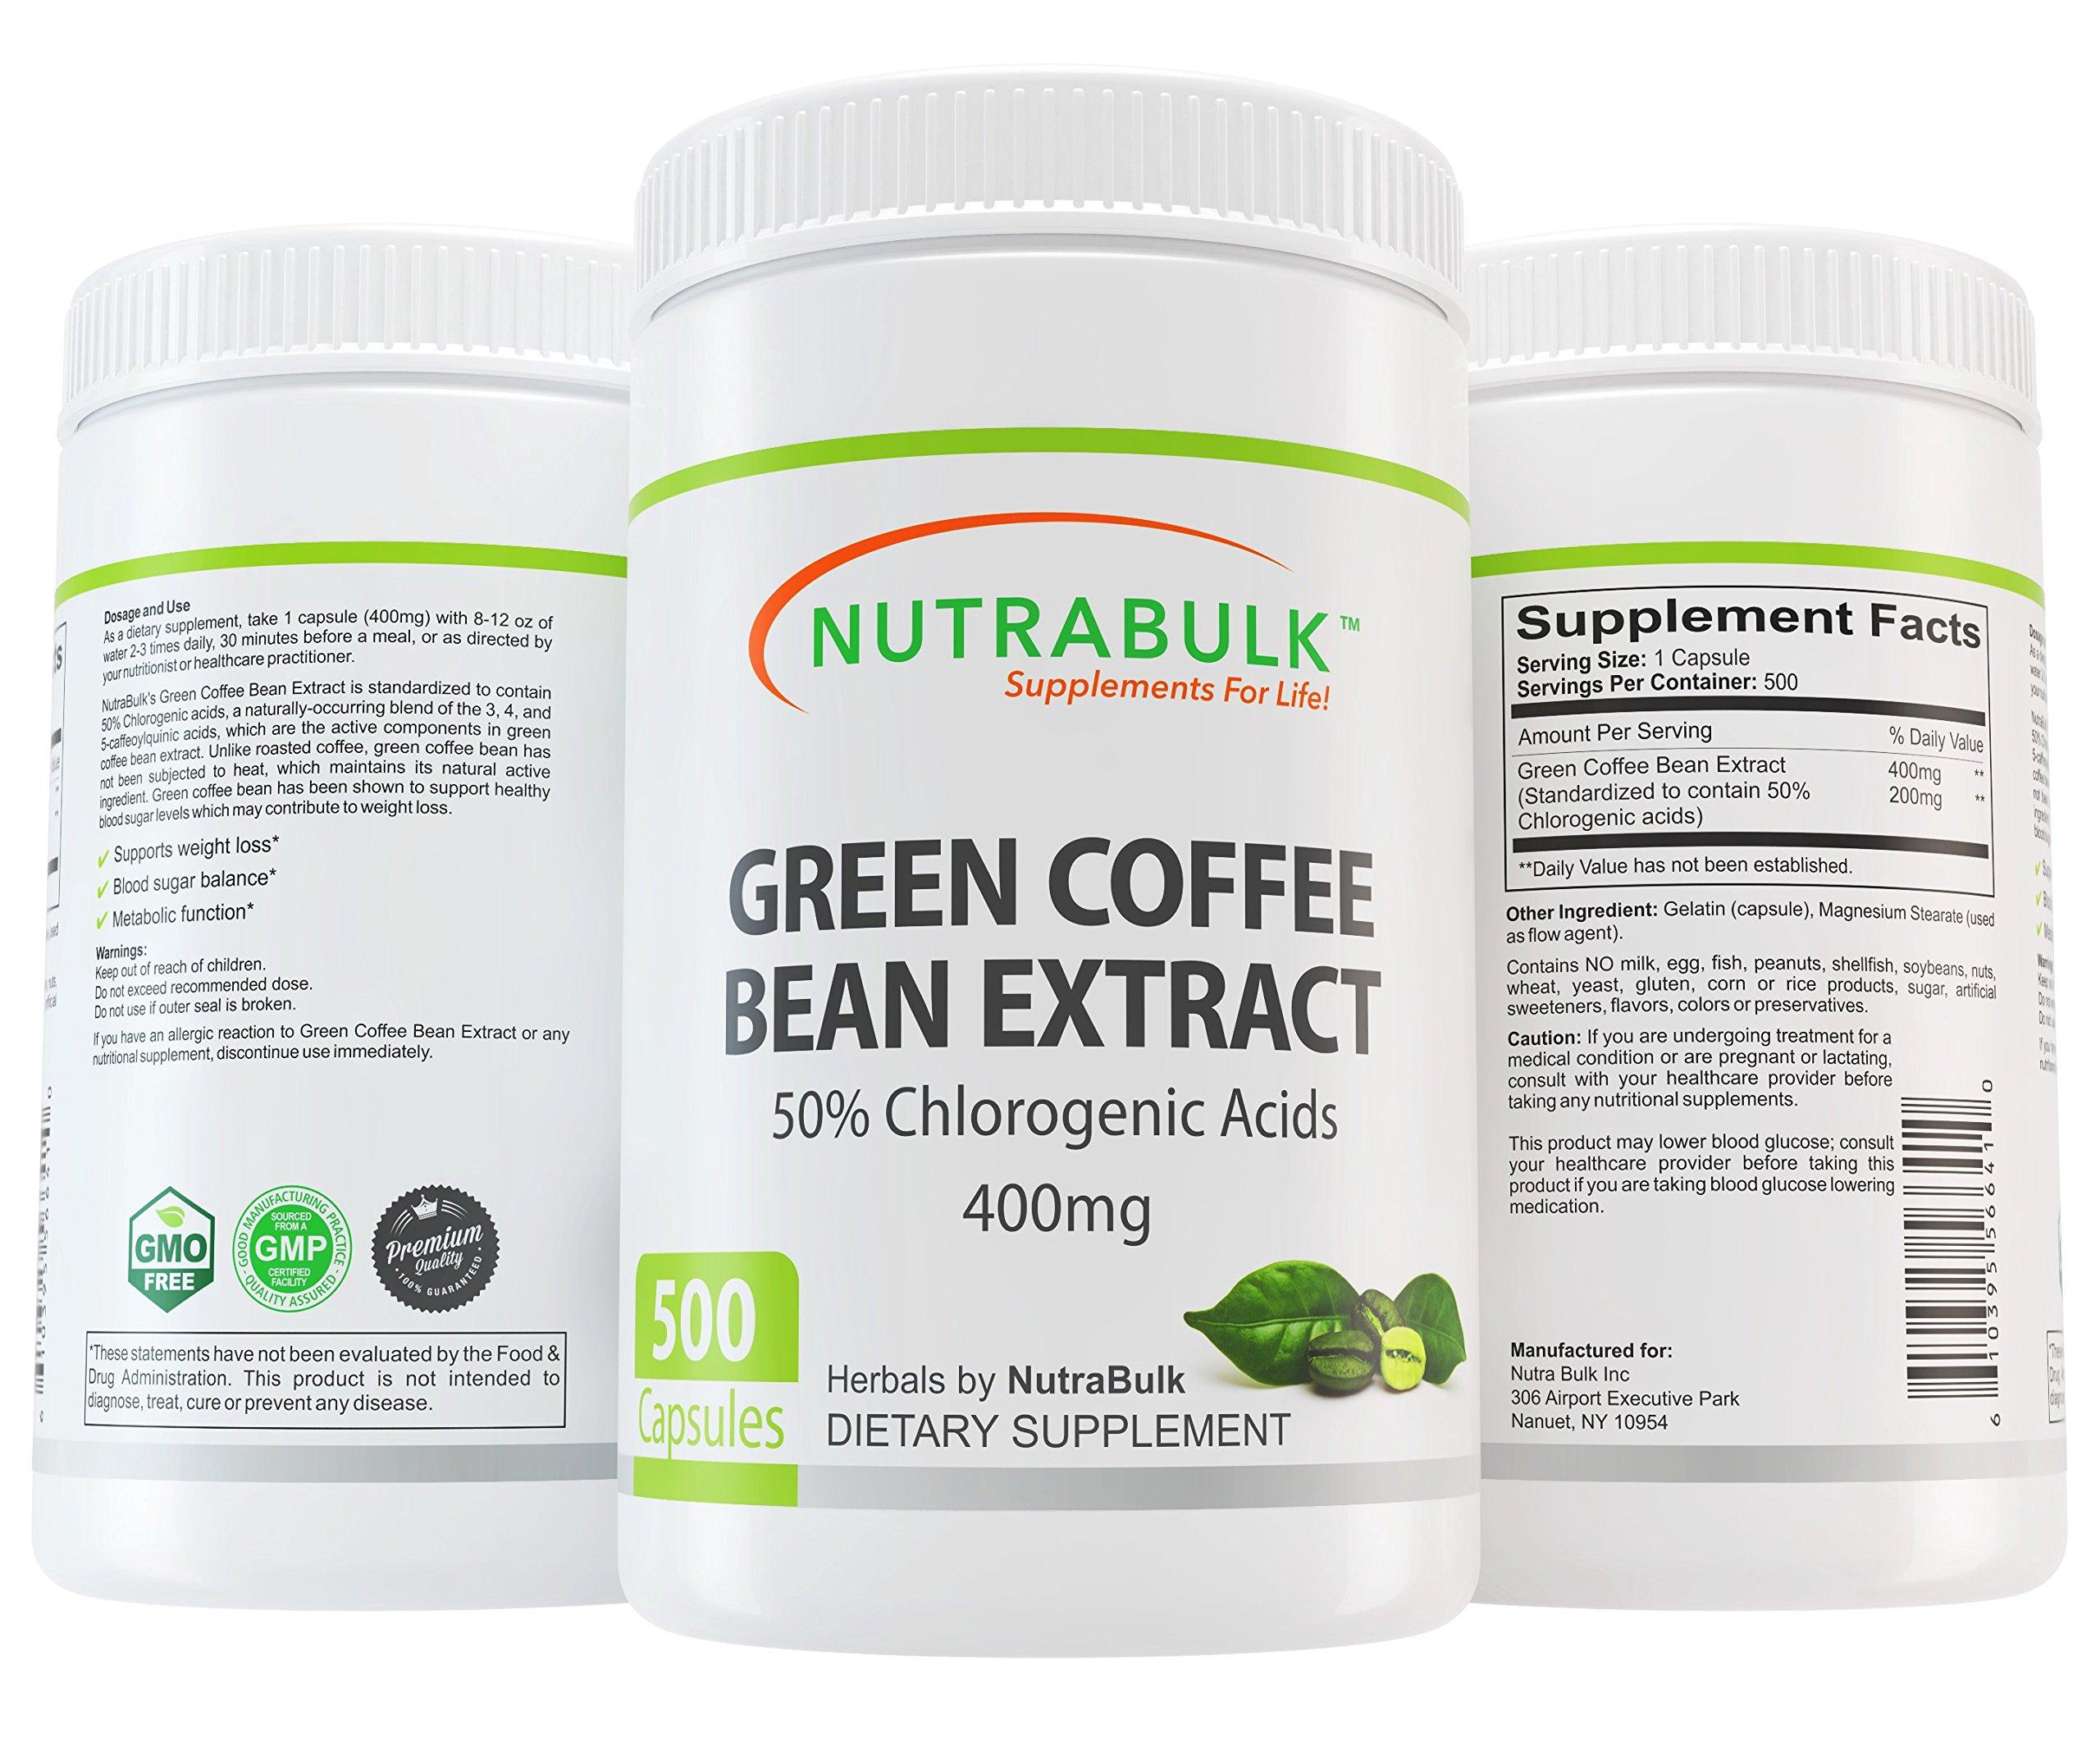 NutraBulk Premium Green Coffee Bean Extract 400mg Capsules - 500 Count